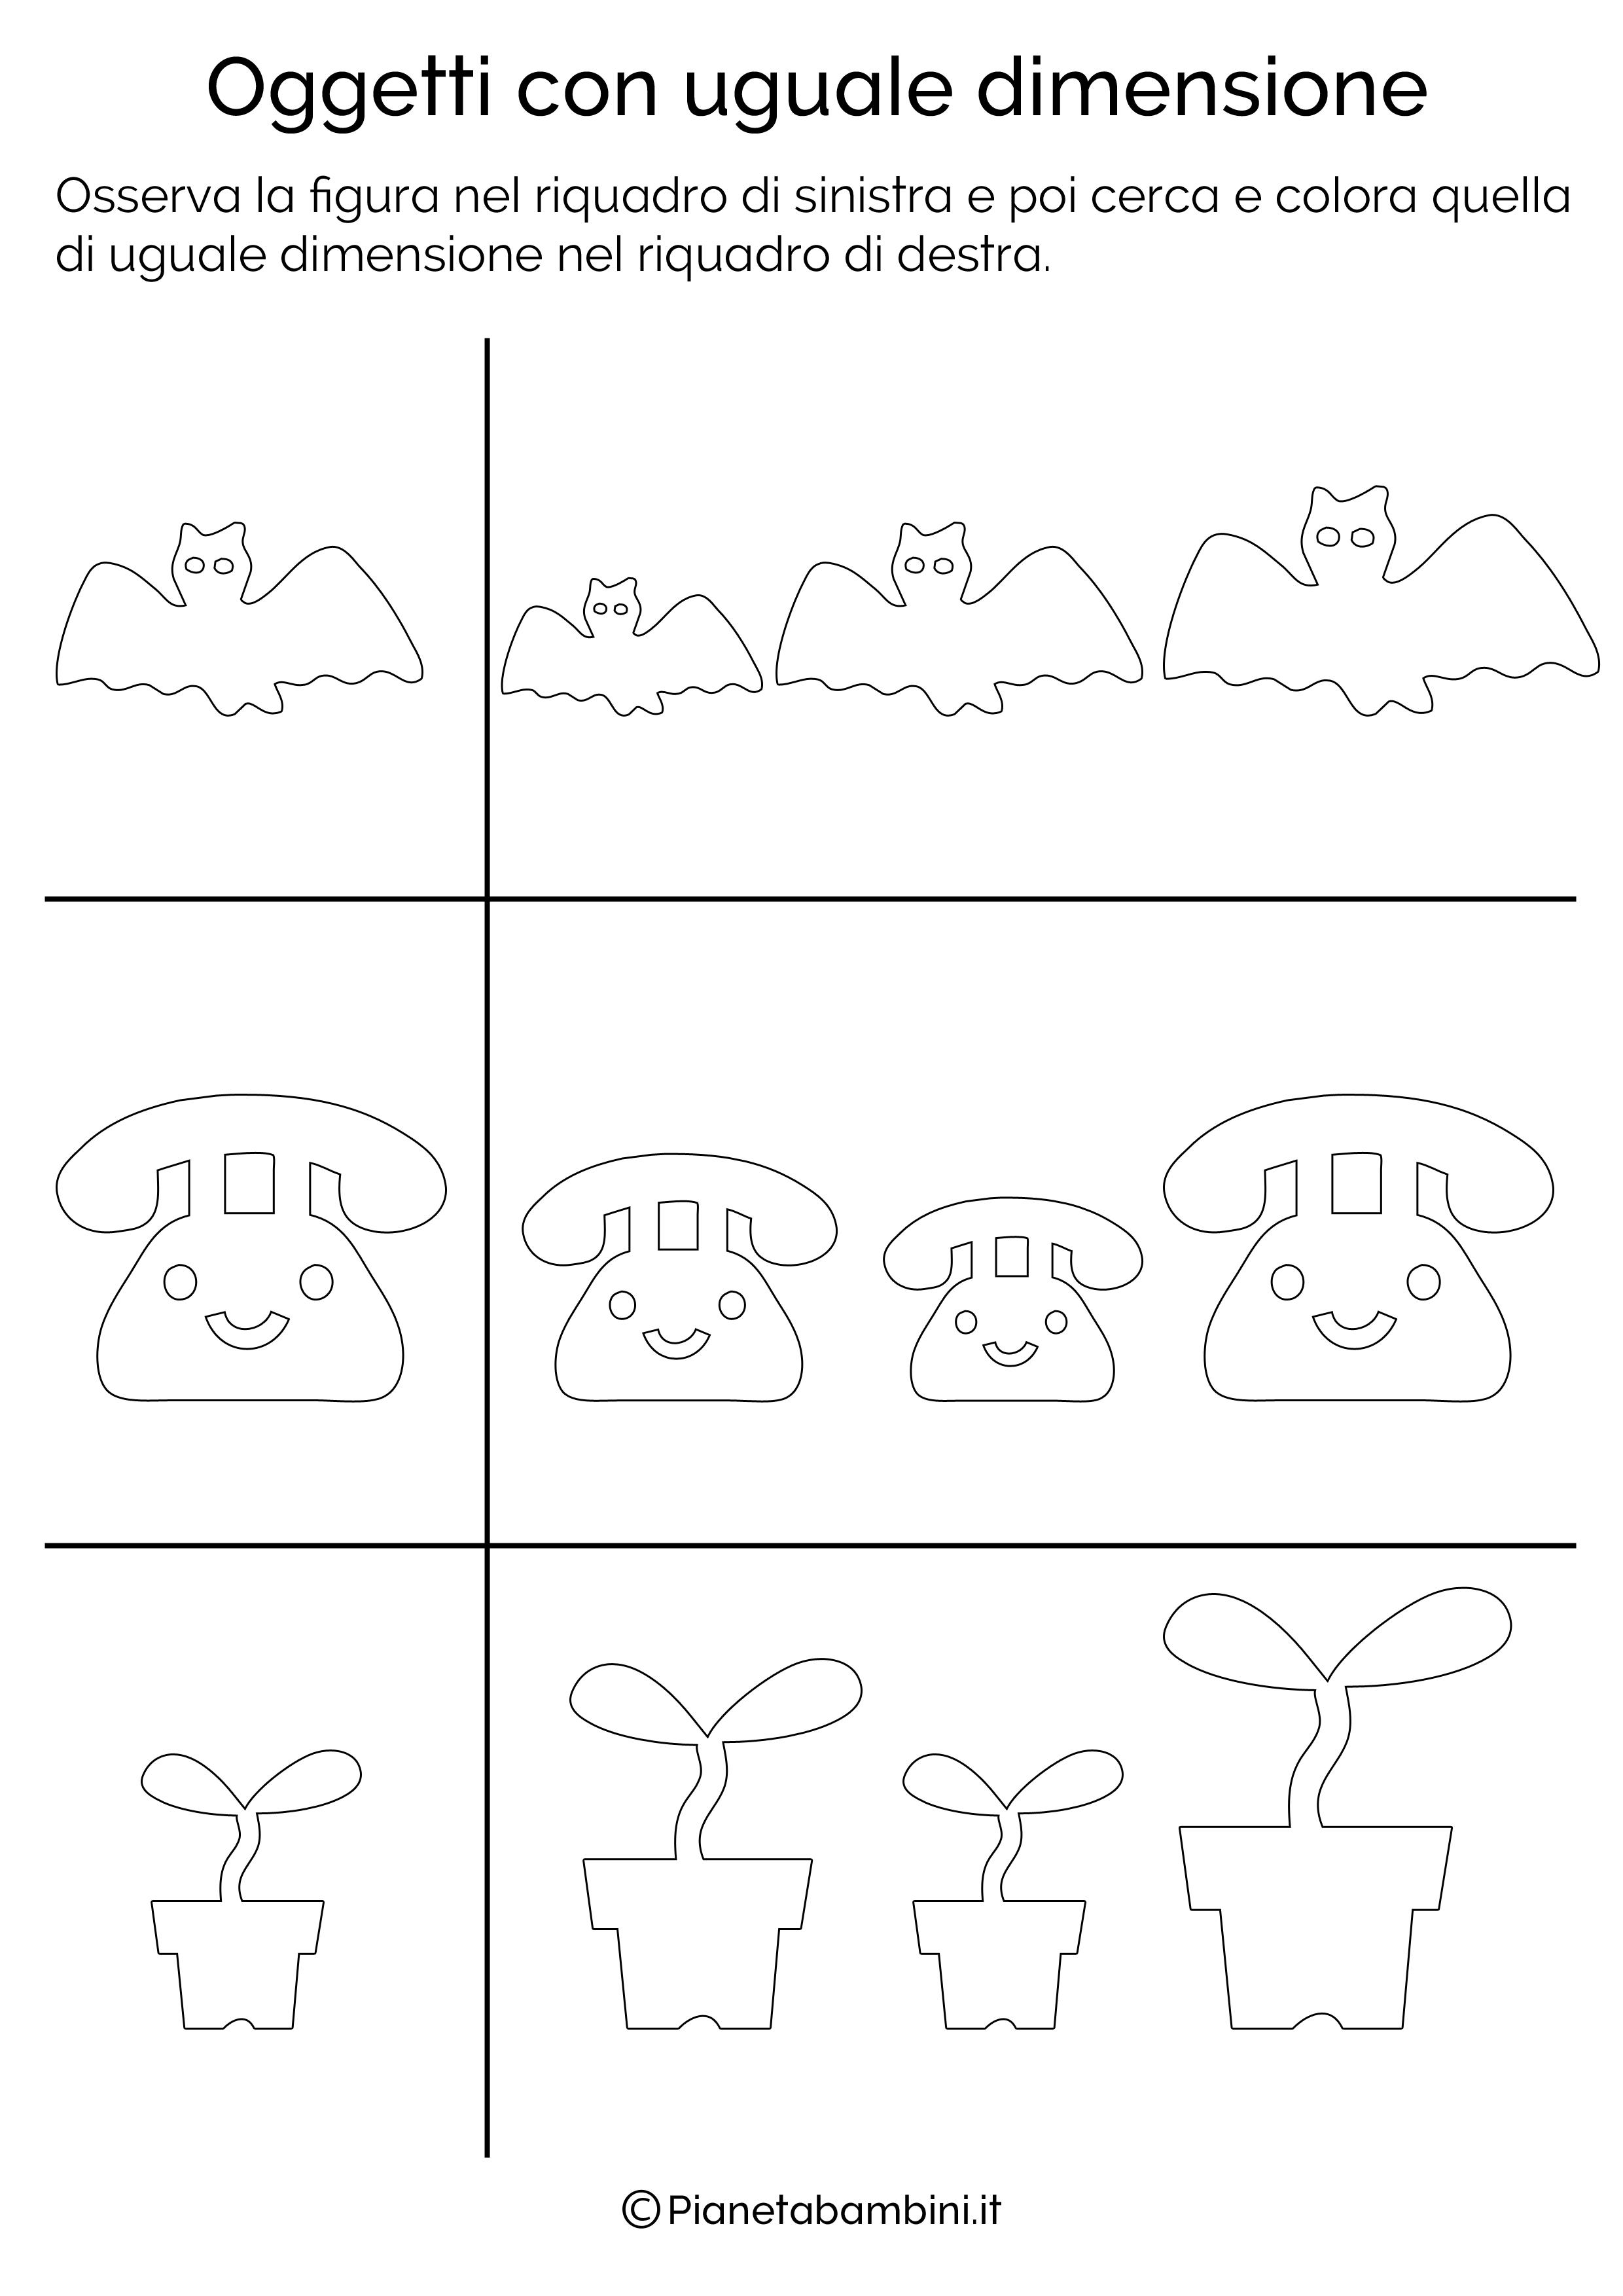 Esercizi-Oggetti-Uguale-Dimensione-2